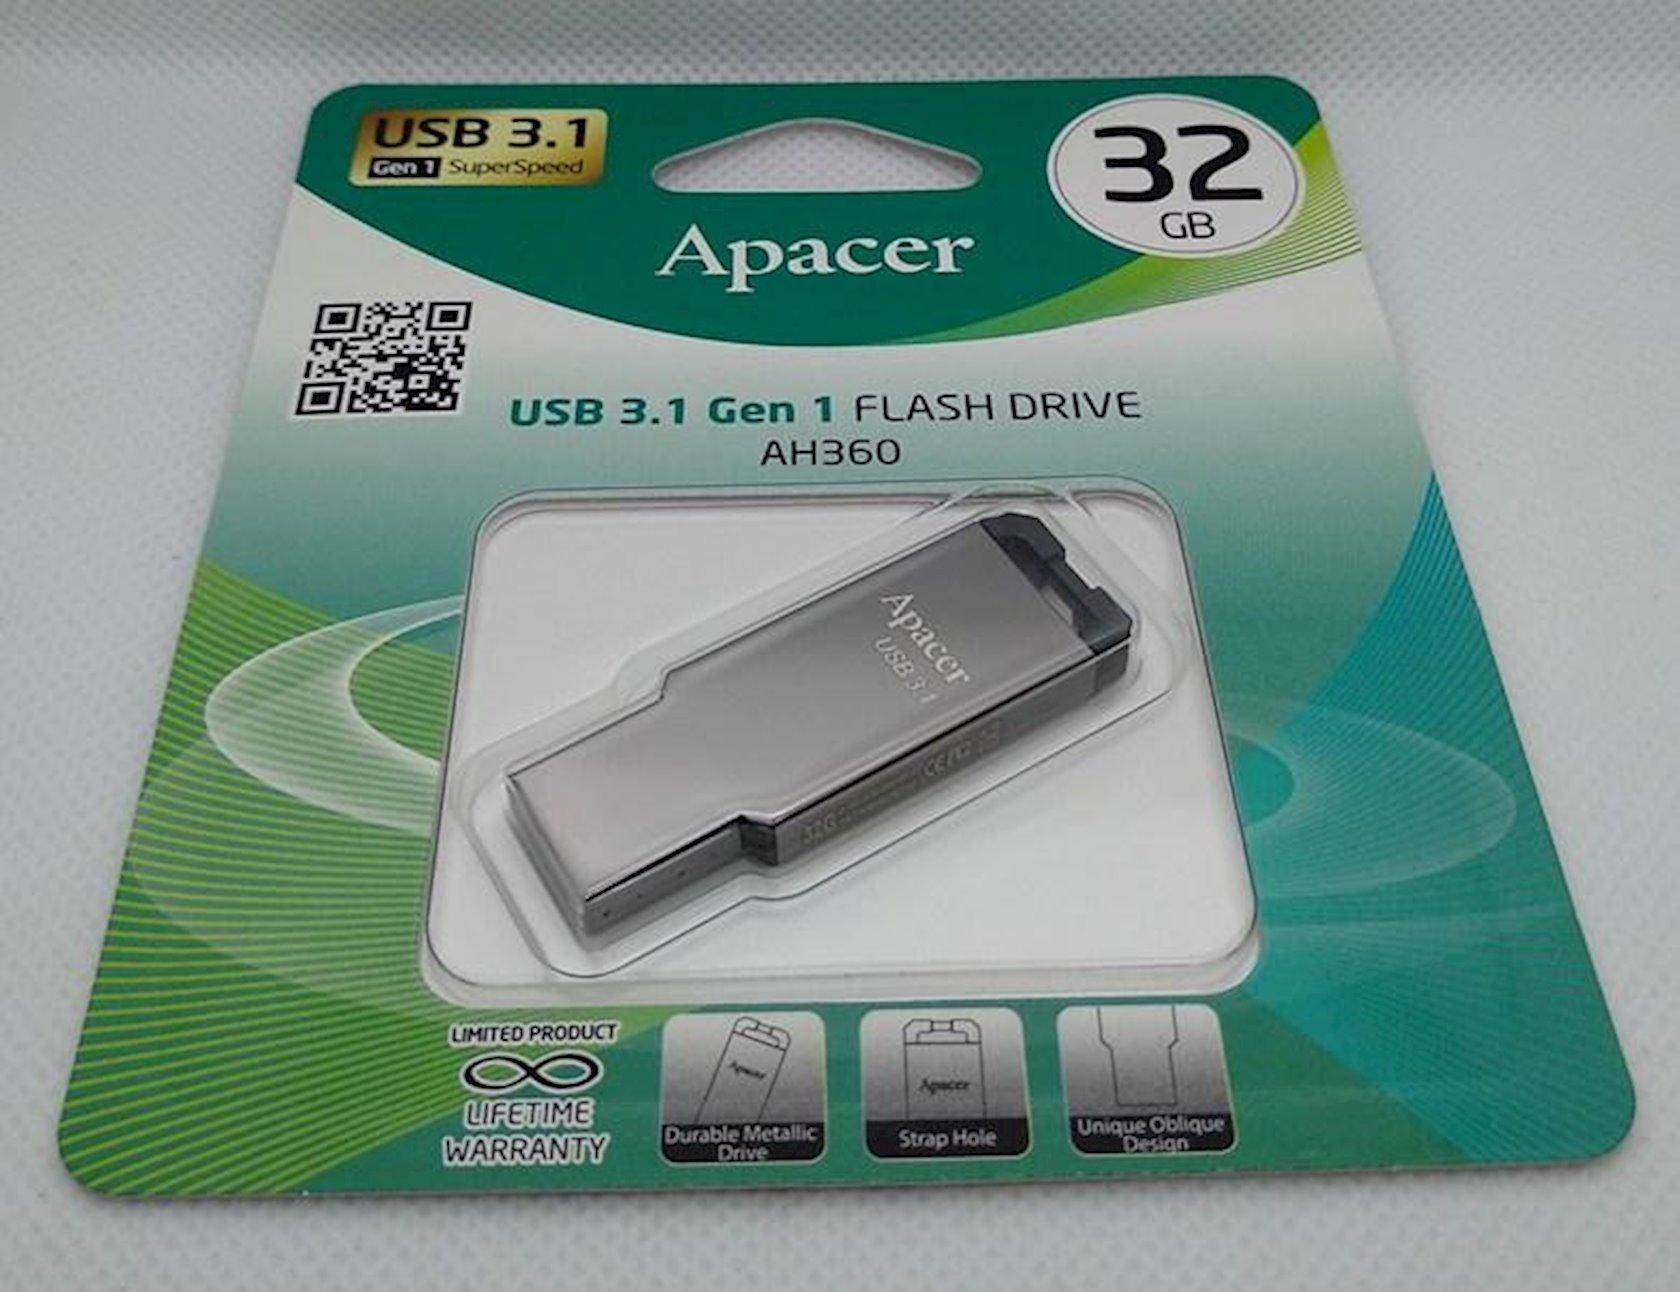 Fləş kart Apacer USB 3.1 Gen1 AH360 Black Nickel 16 Gb